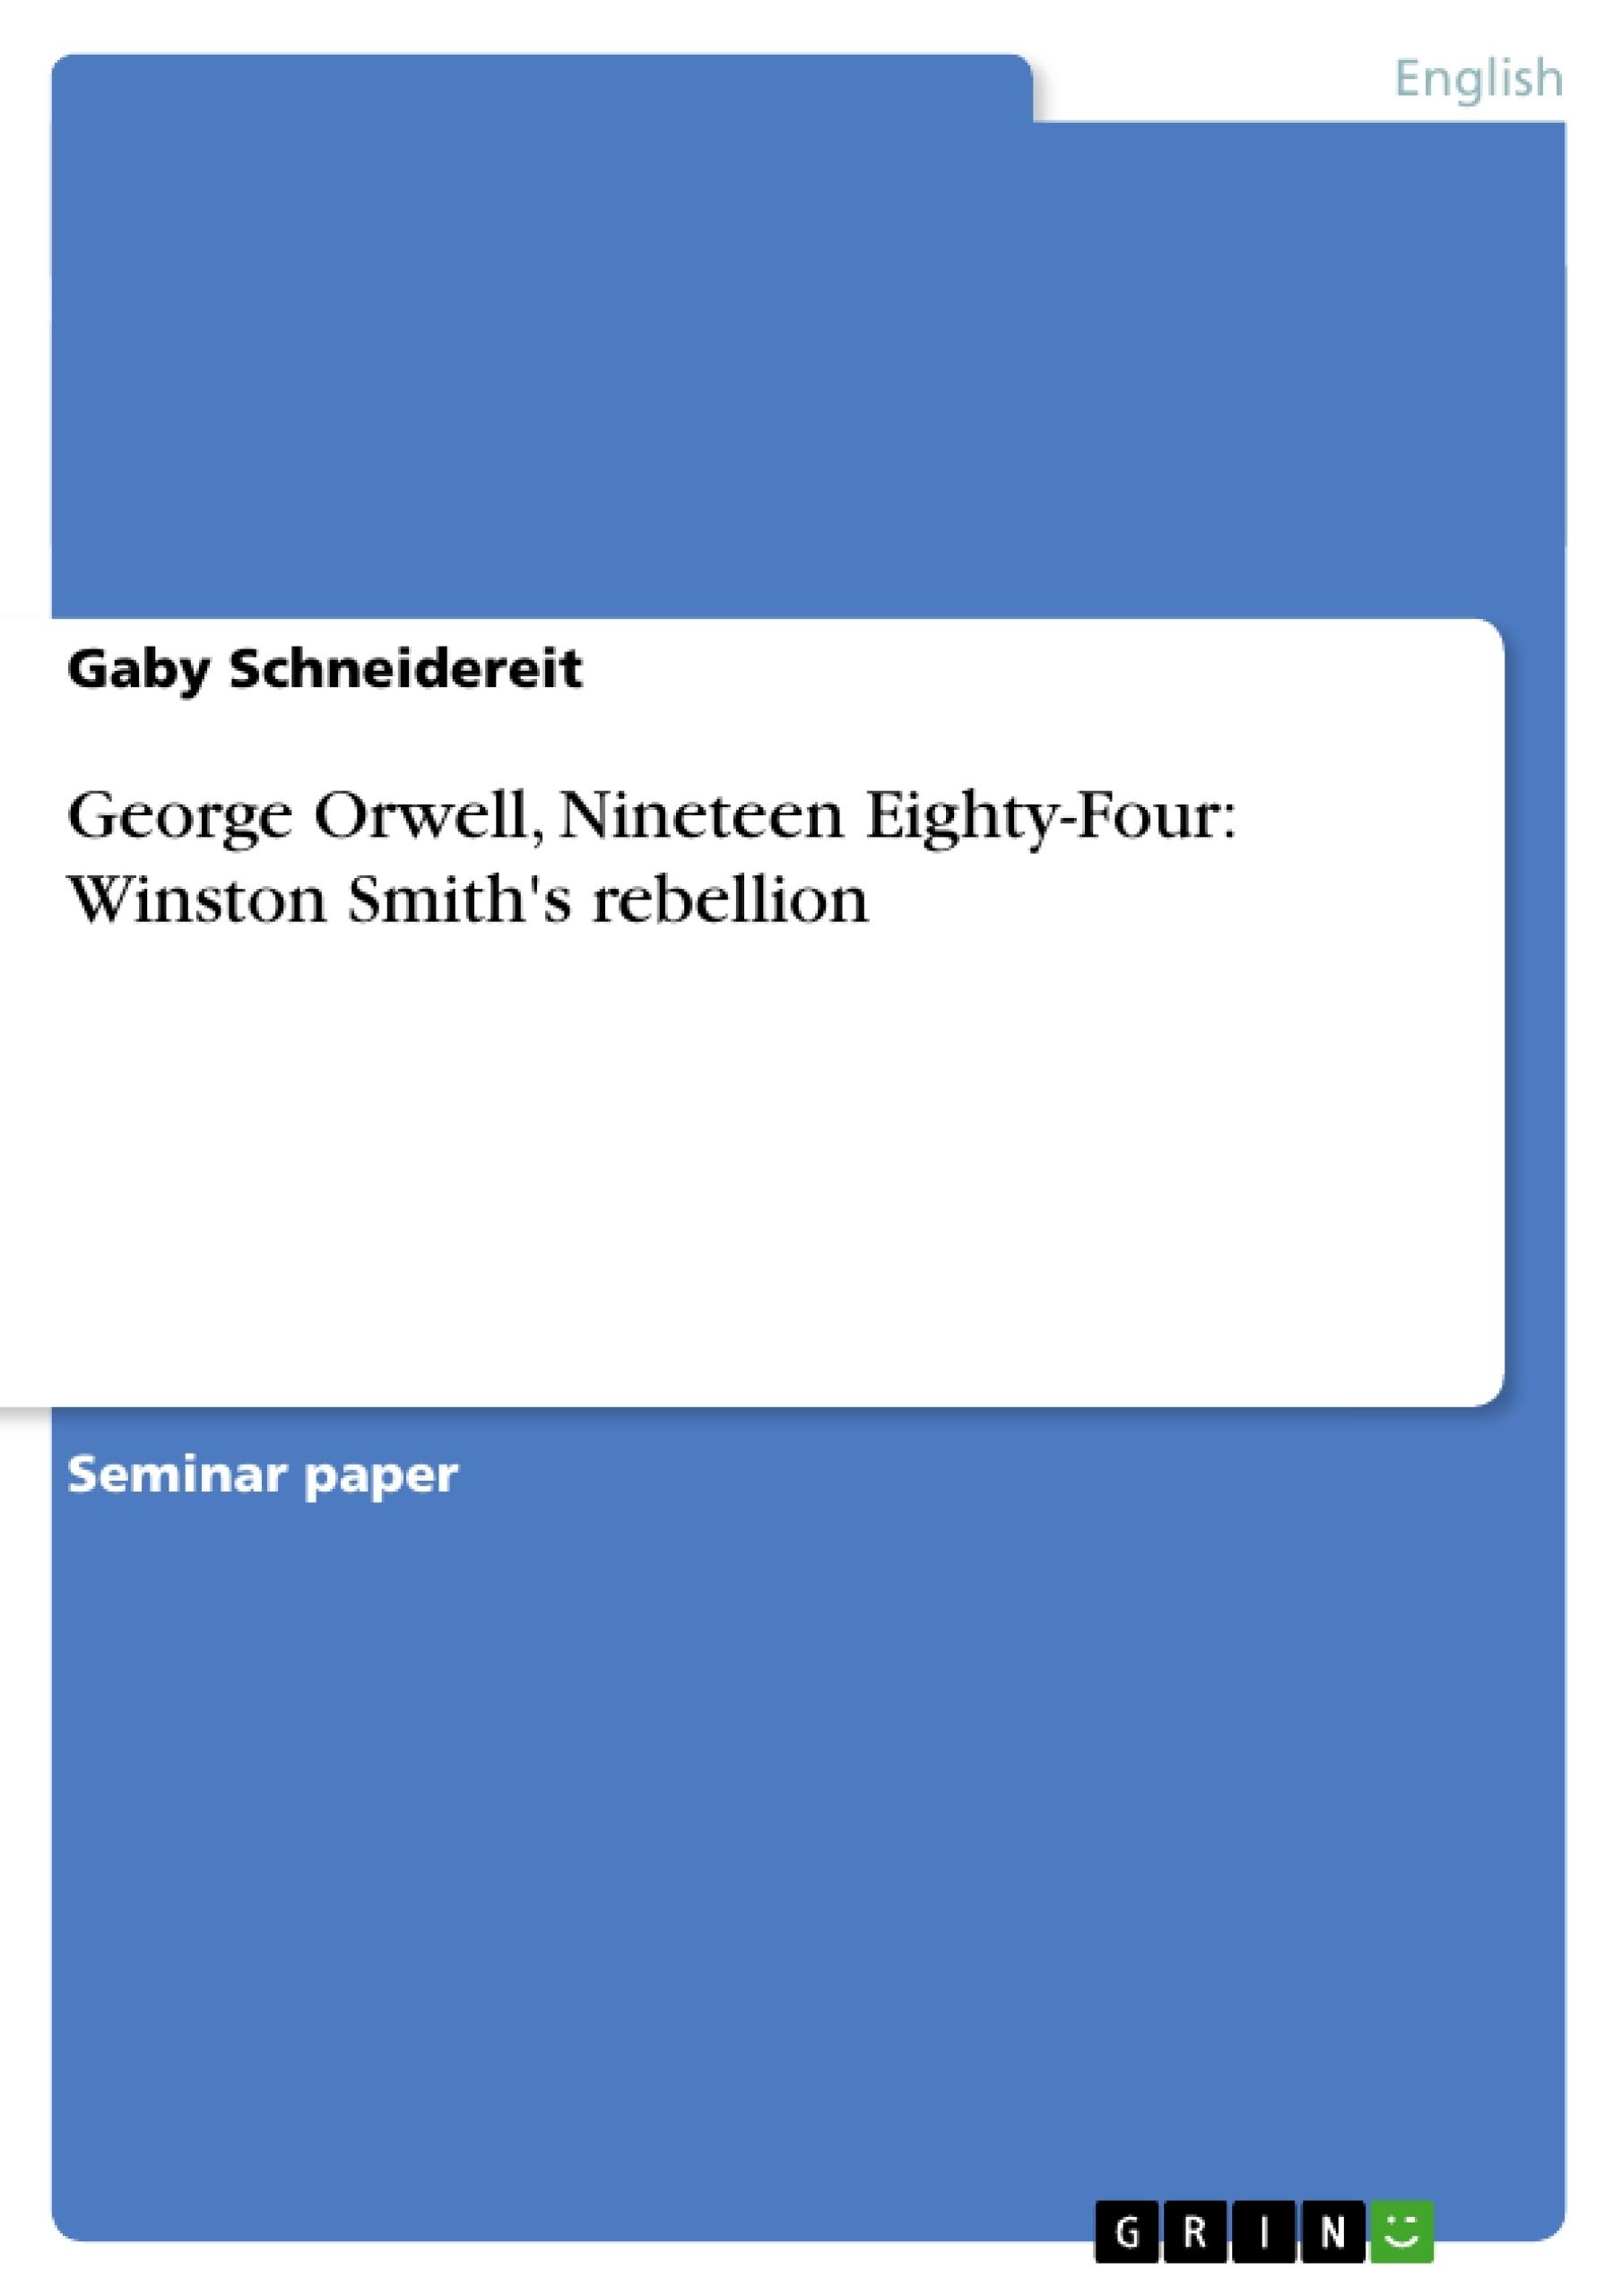 Title: George Orwell, Nineteen Eighty-Four: Winston Smith's rebellion